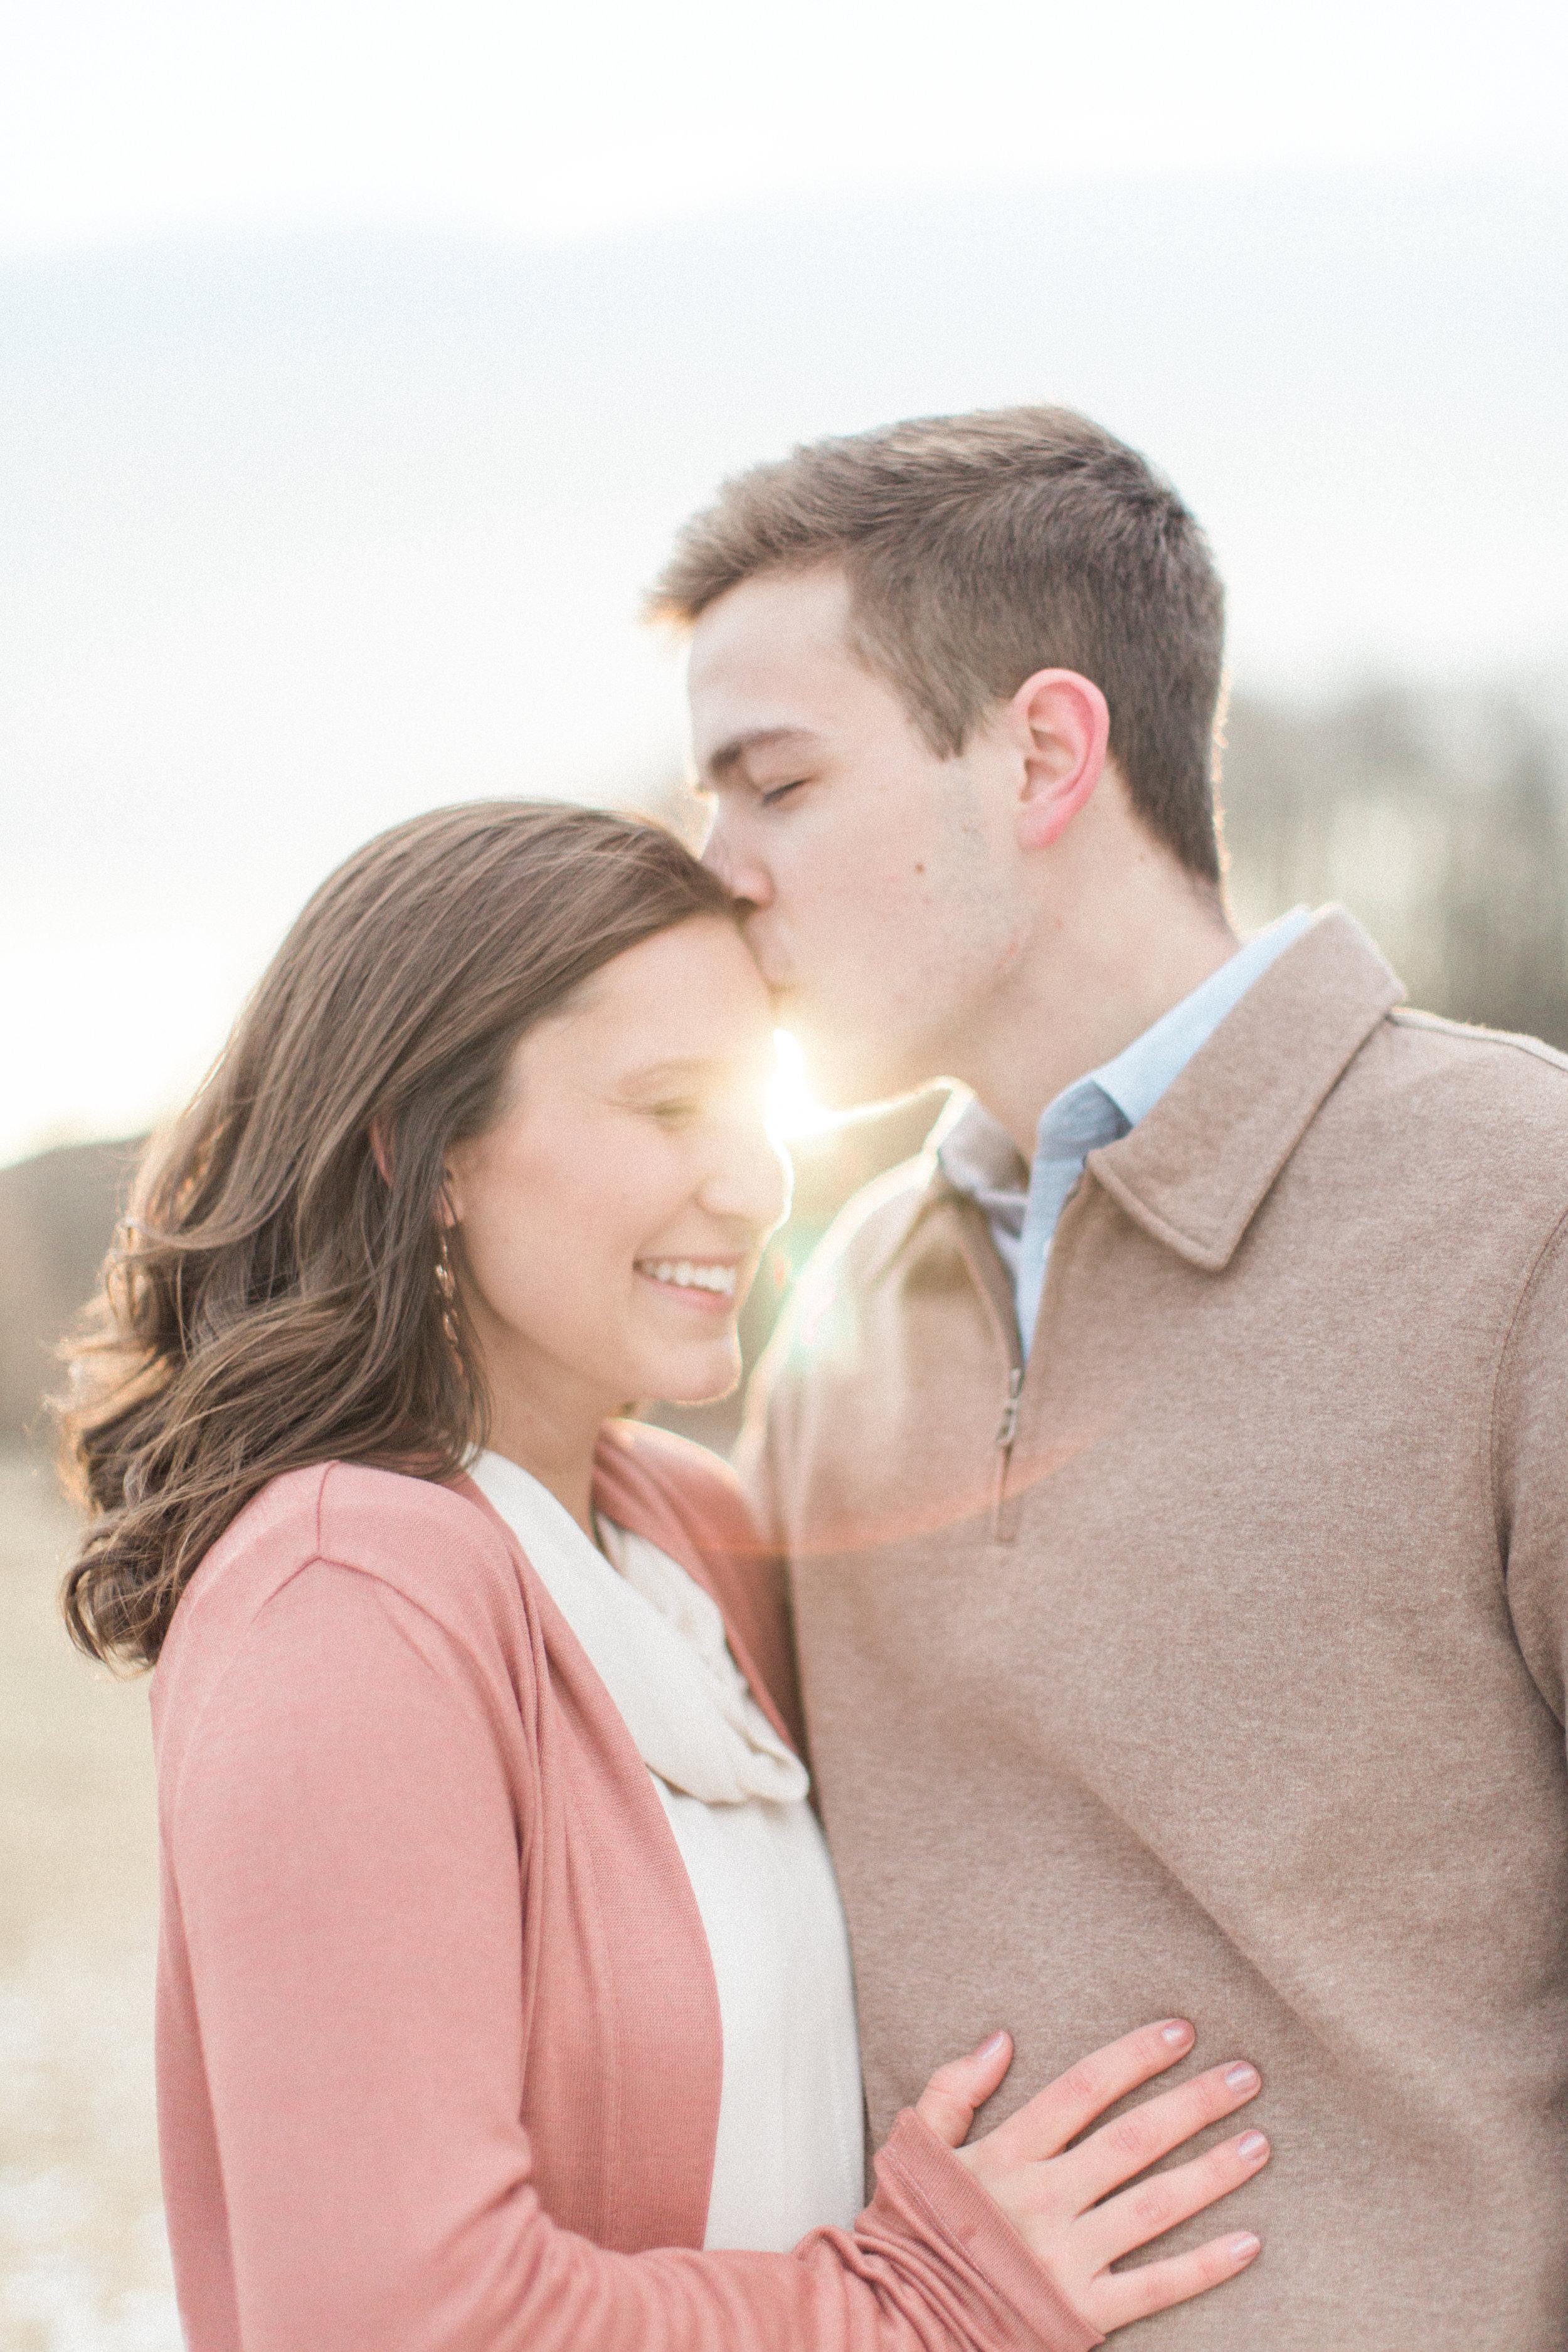 Abigail_Jill_Photography_Maryland_Engagement_Farm_Emily_Justin52.jpg